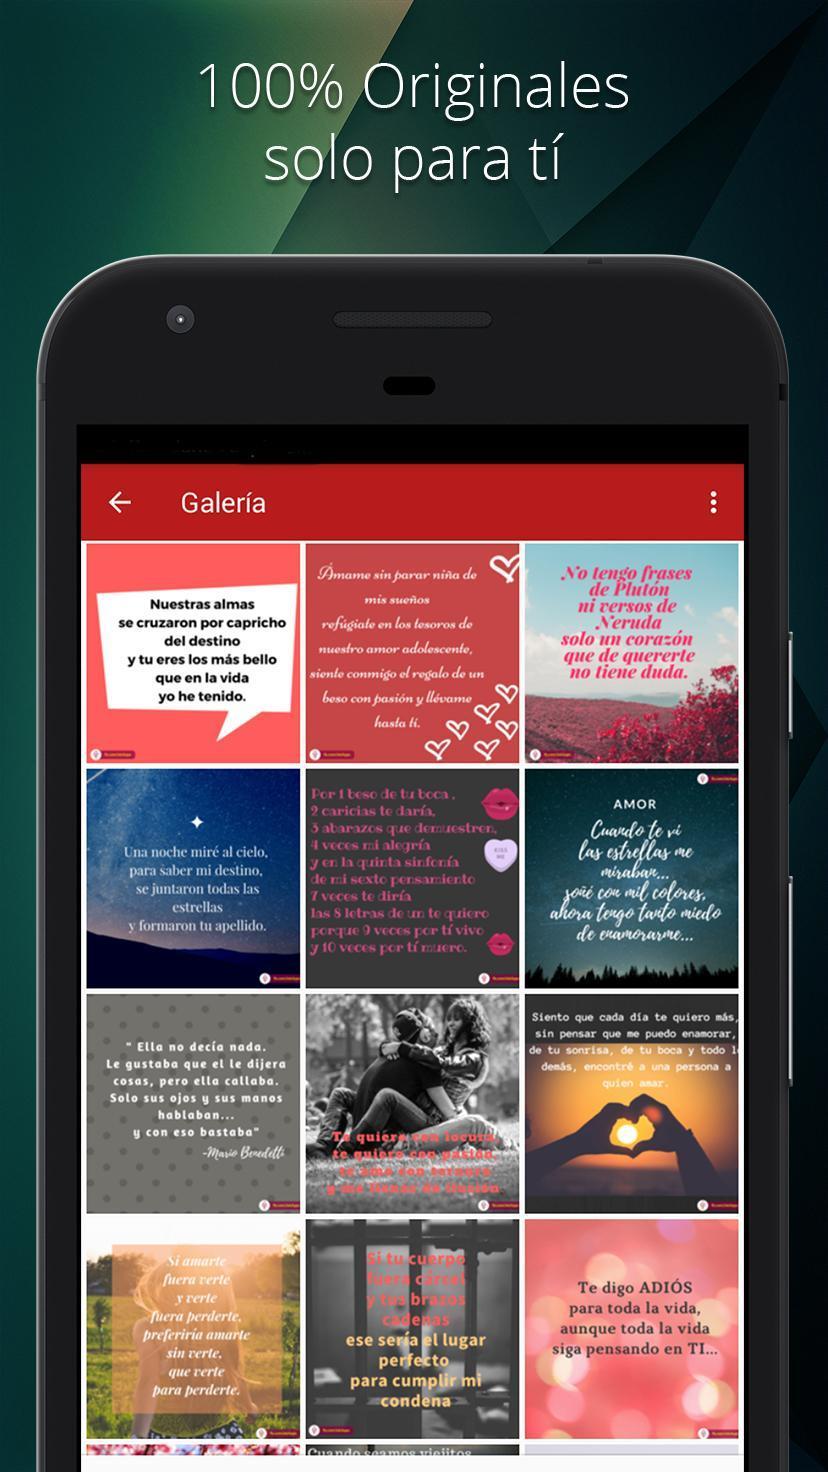 Frases De Amor Y Versos Bonito For Android Apk Download